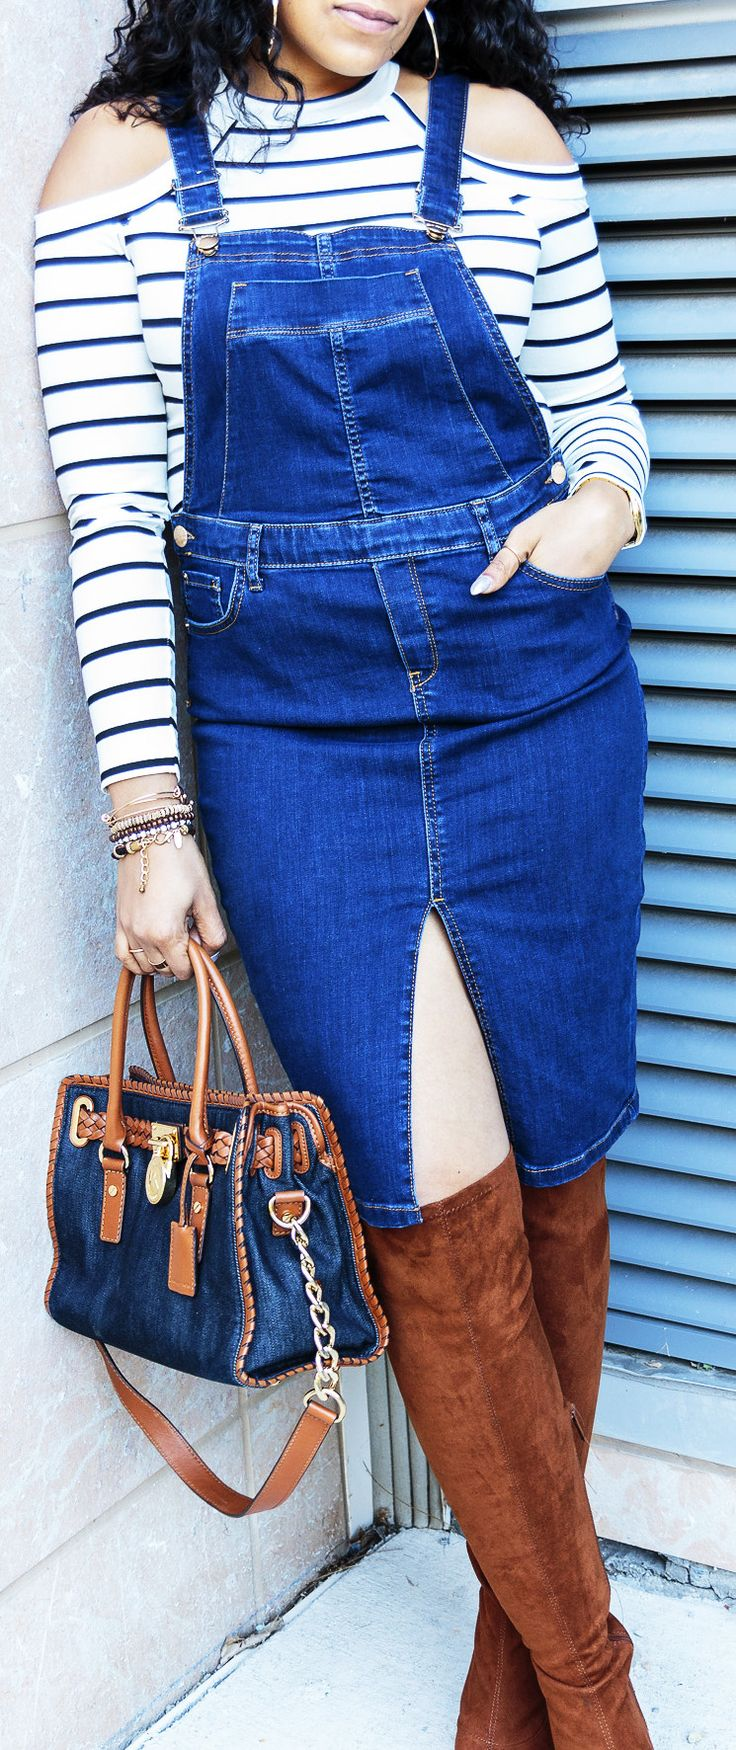 RiverIsland Overall Dress | ASOS Striped Cold Shoulder Top | Akira Chicago Over the Knee Boot | Michael Kors Denim Handbag